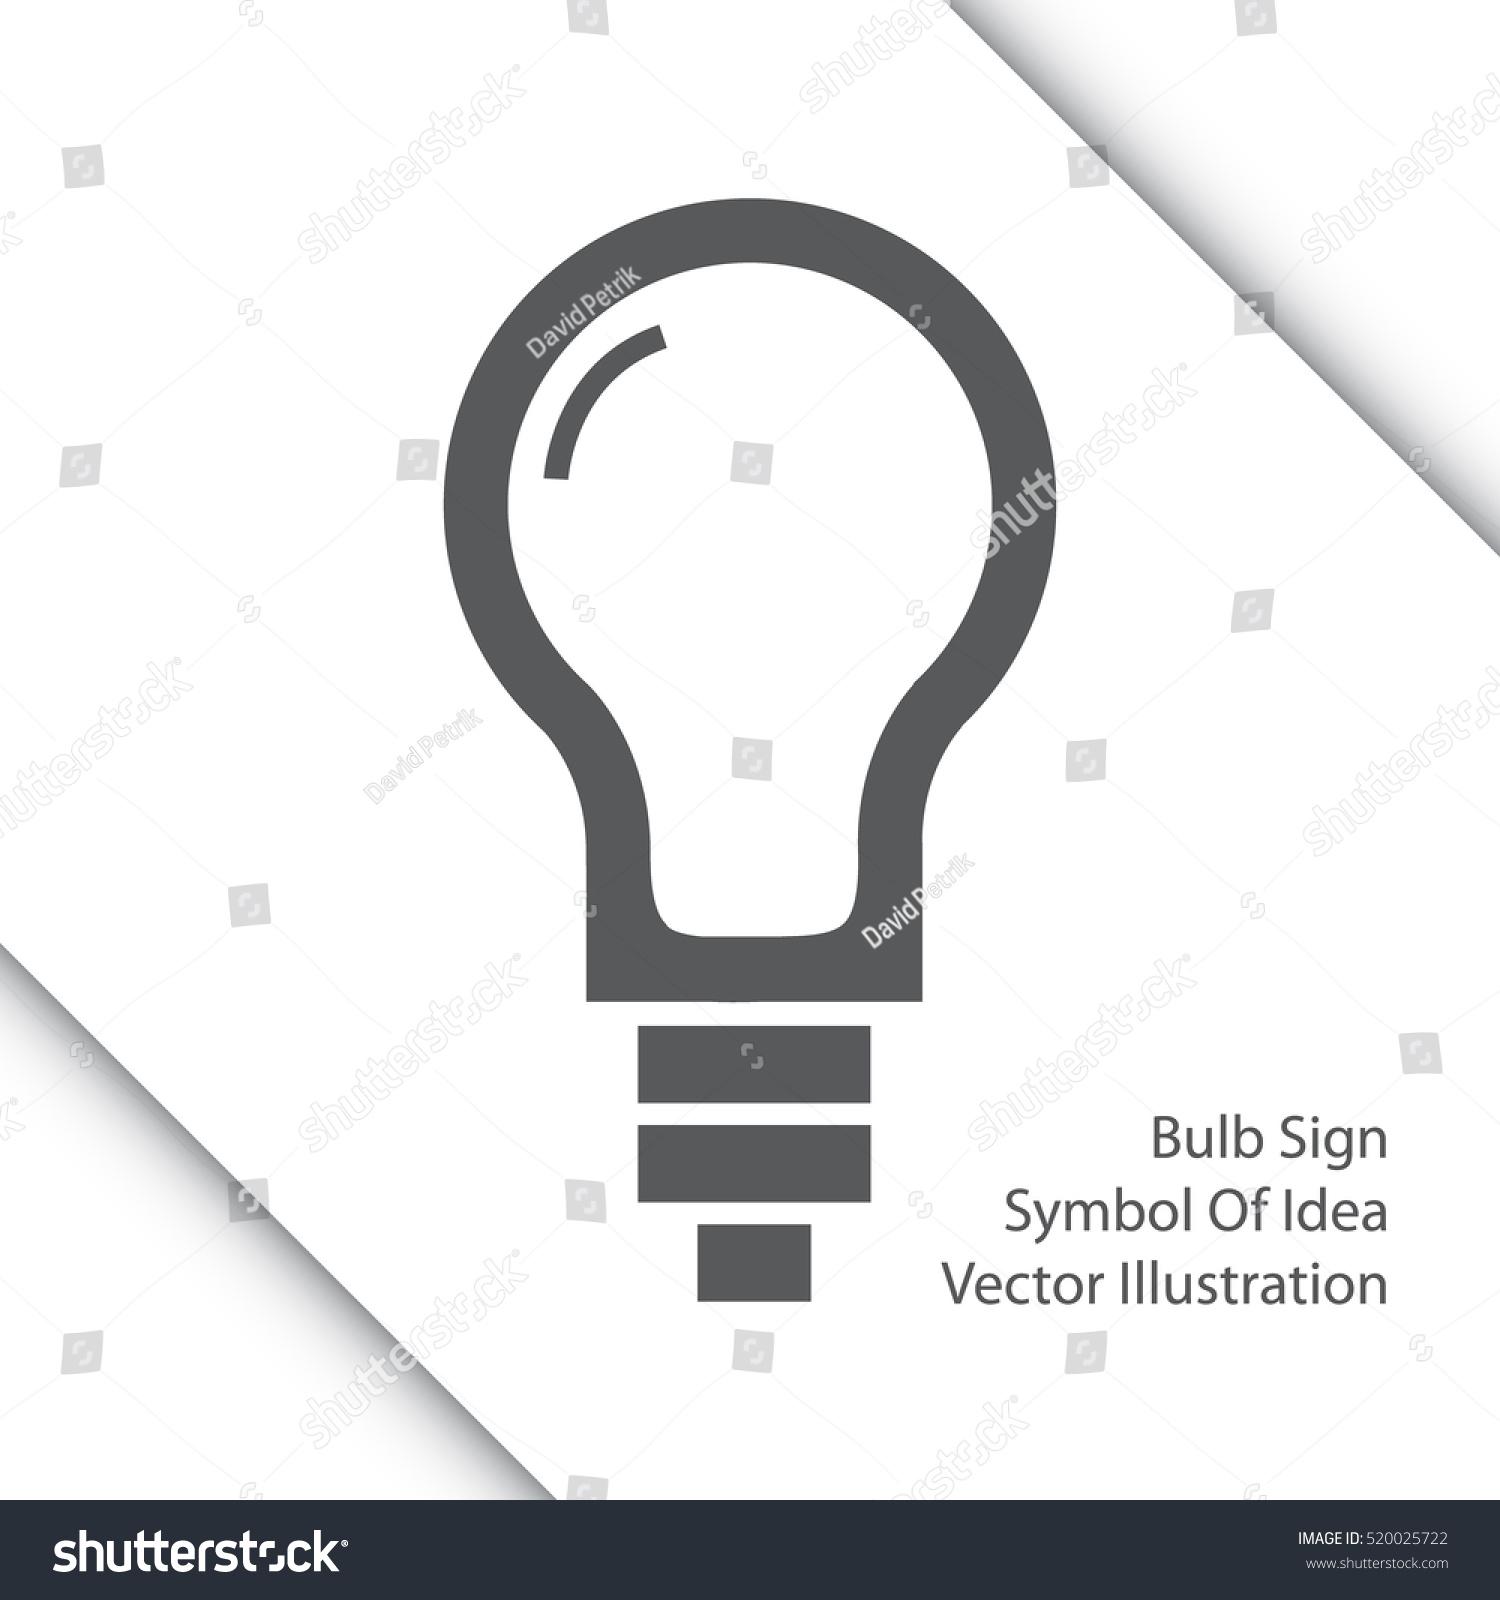 Light bulb line icon sign thinking stock vector 520025722 light bulb line icon sign thinking stock vector 520025722 shutterstock biocorpaavc